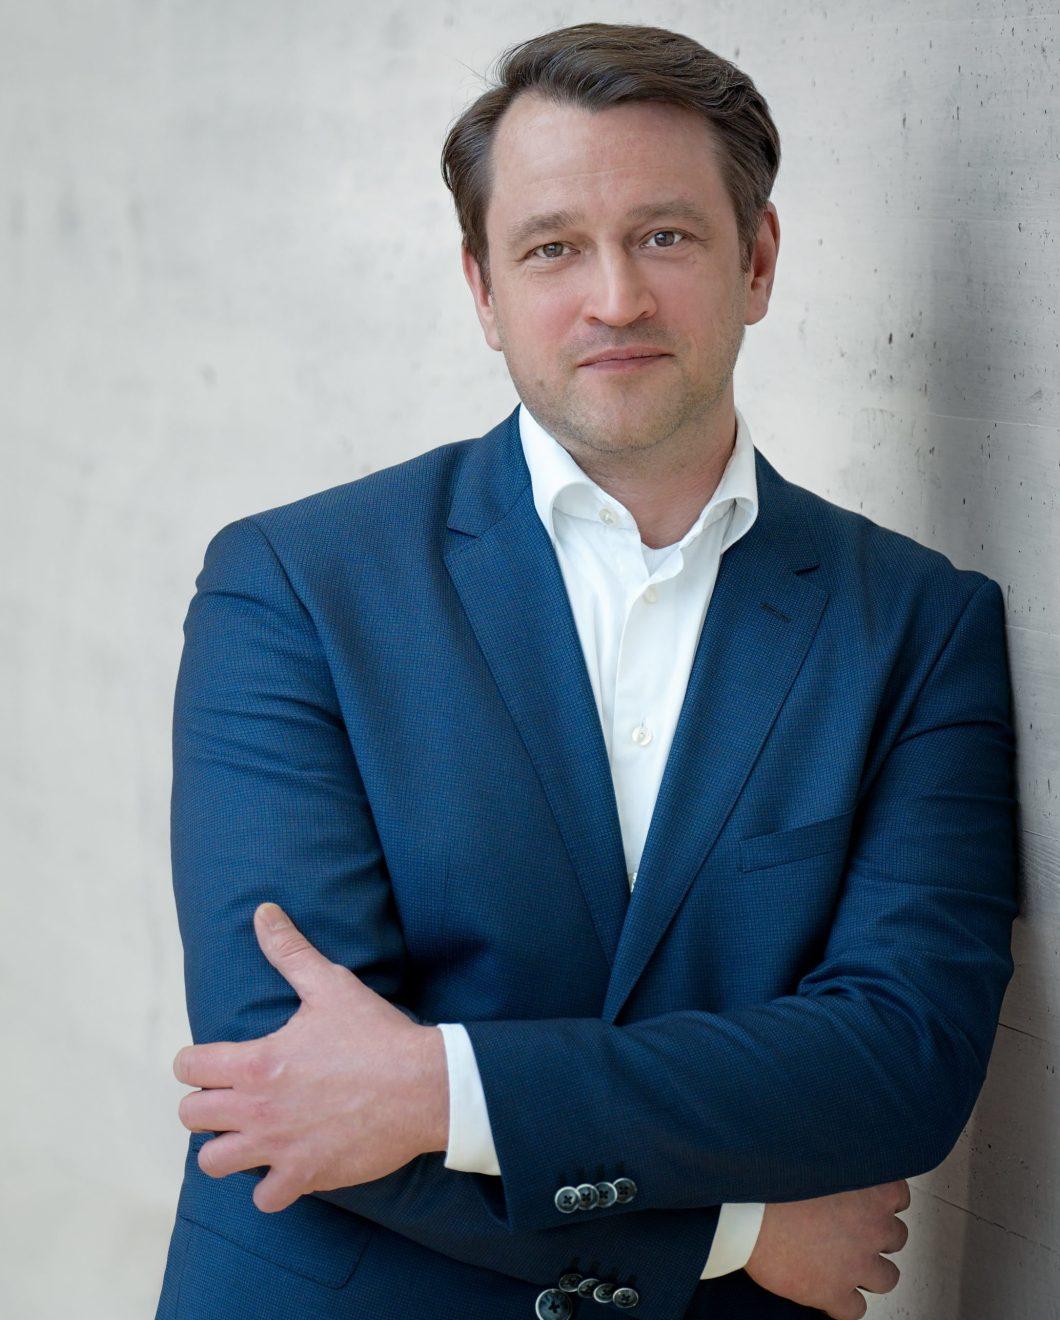 Marek_Schwiesau1